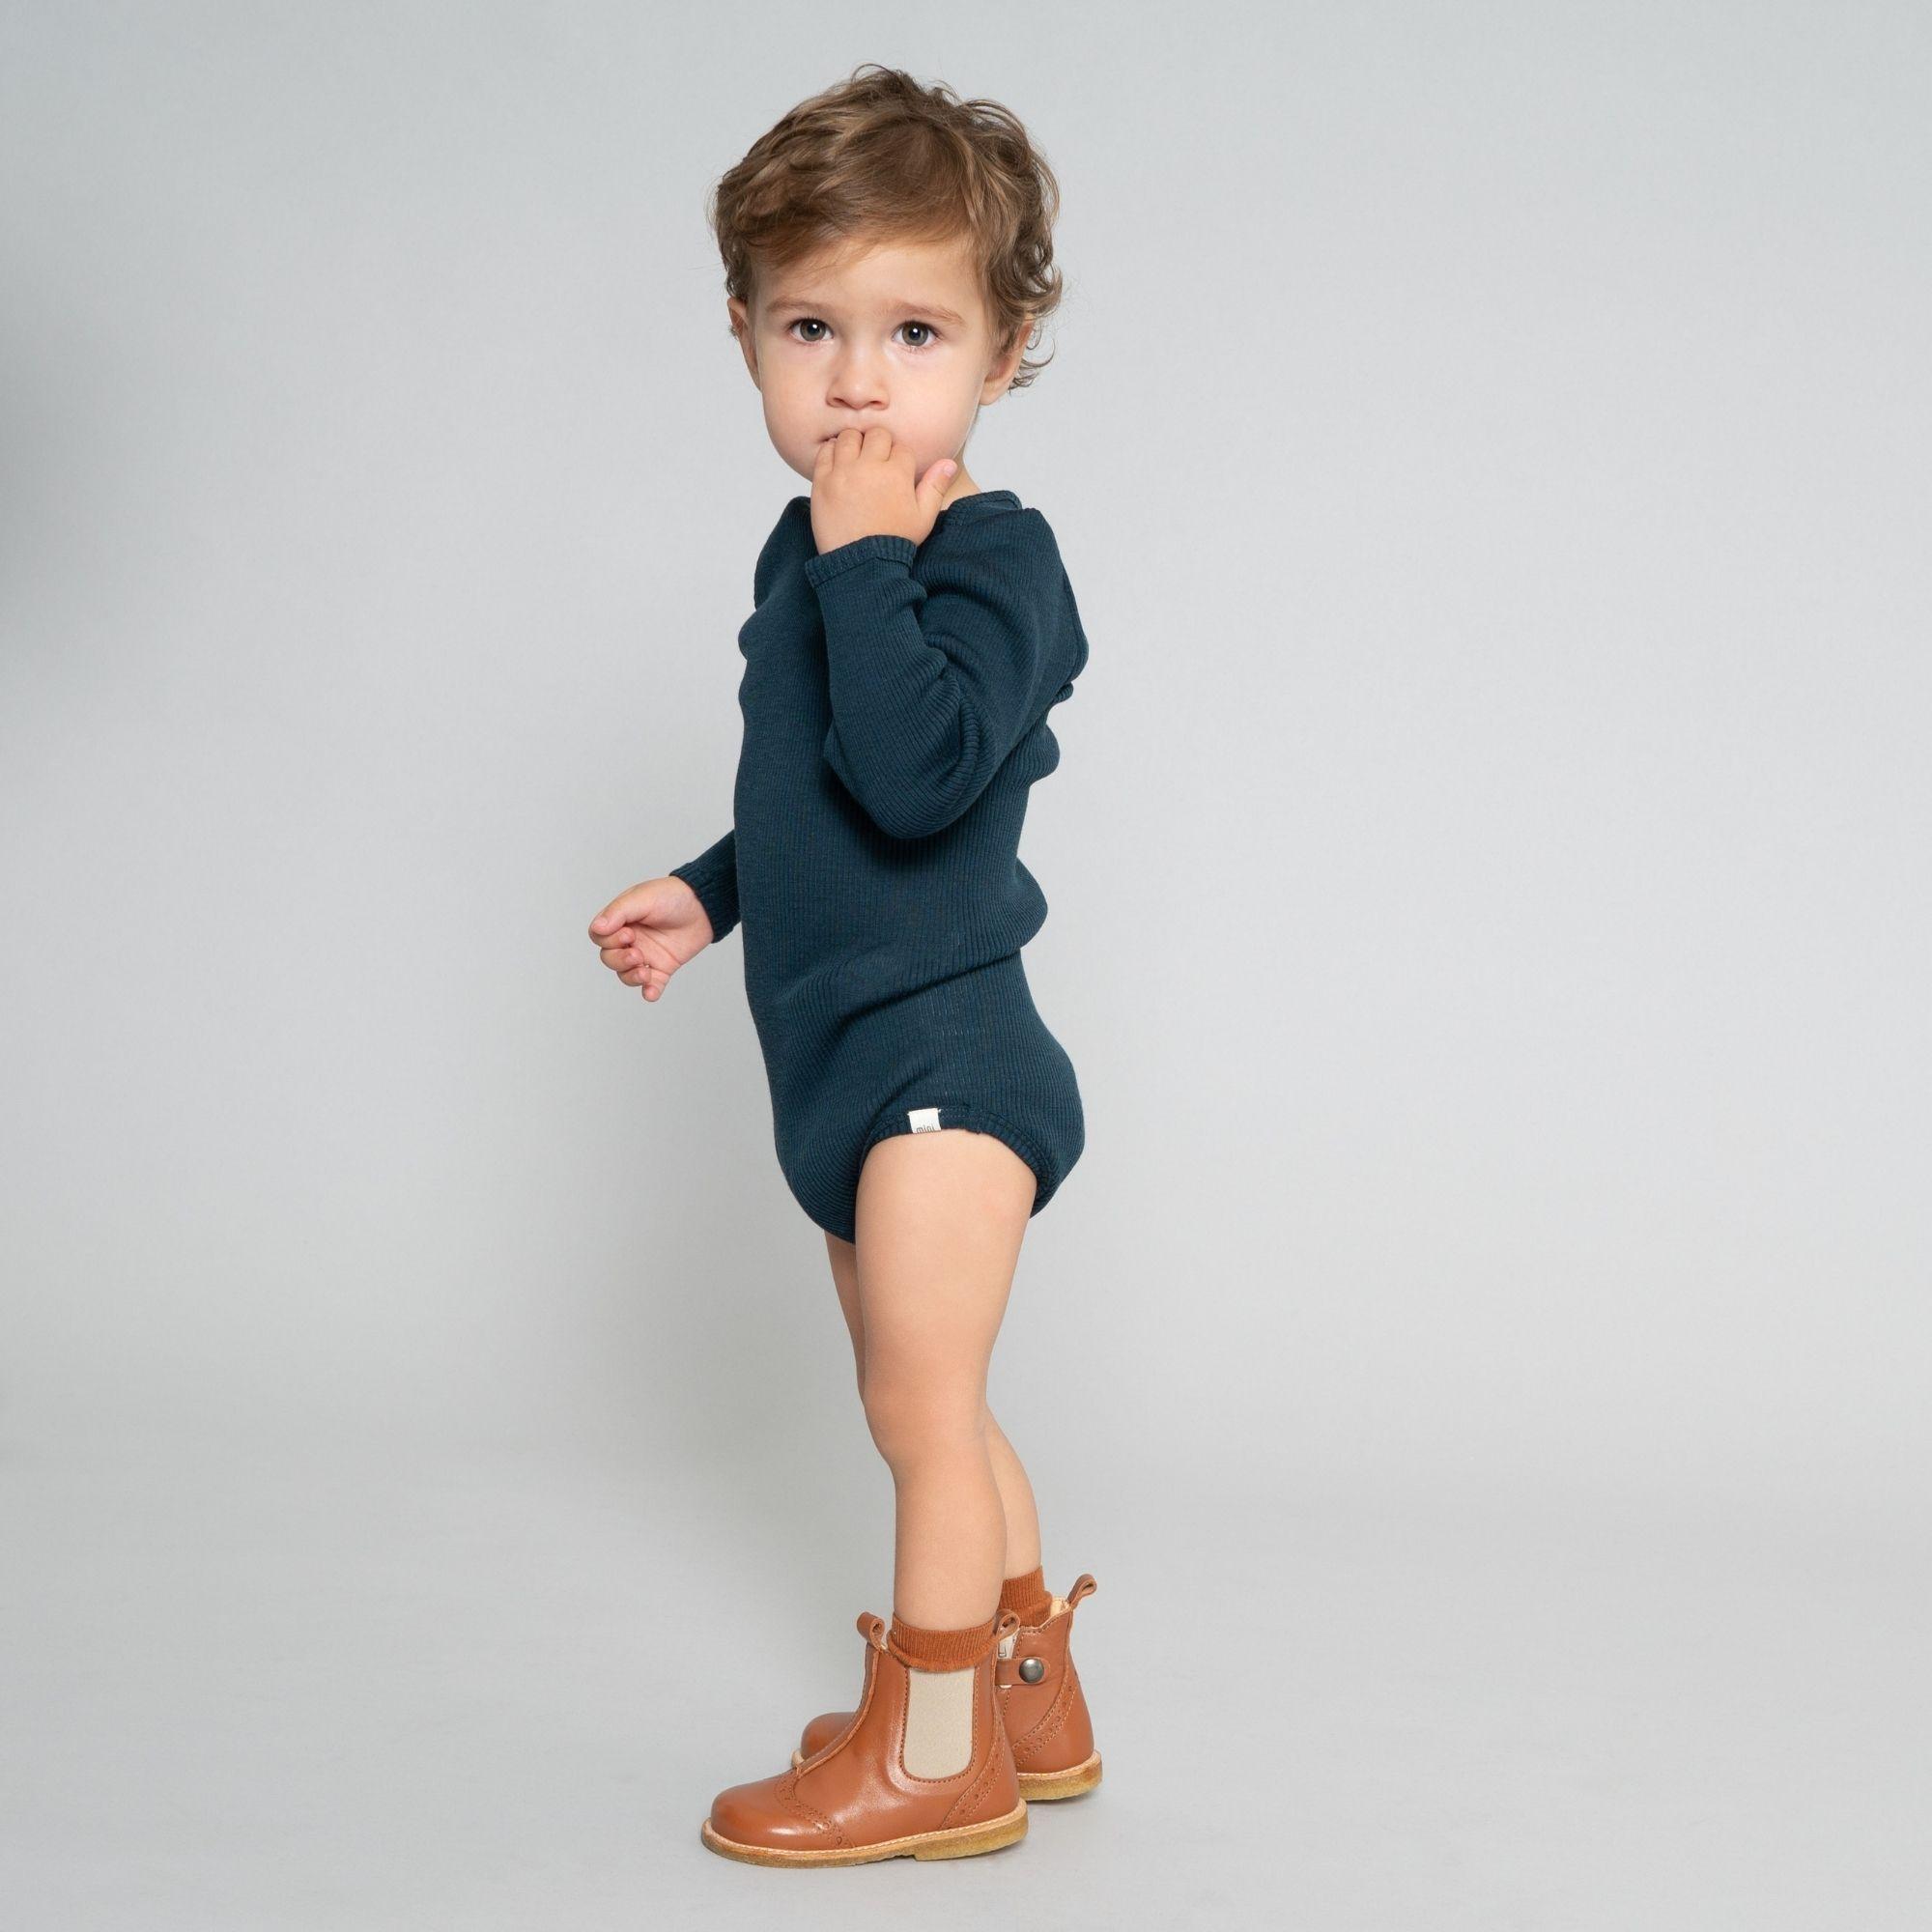 body-bebe-enfant-pure-laine-merinos-minimalisma-maison-de-mamoulia-alaska-bleu-navy-teal--